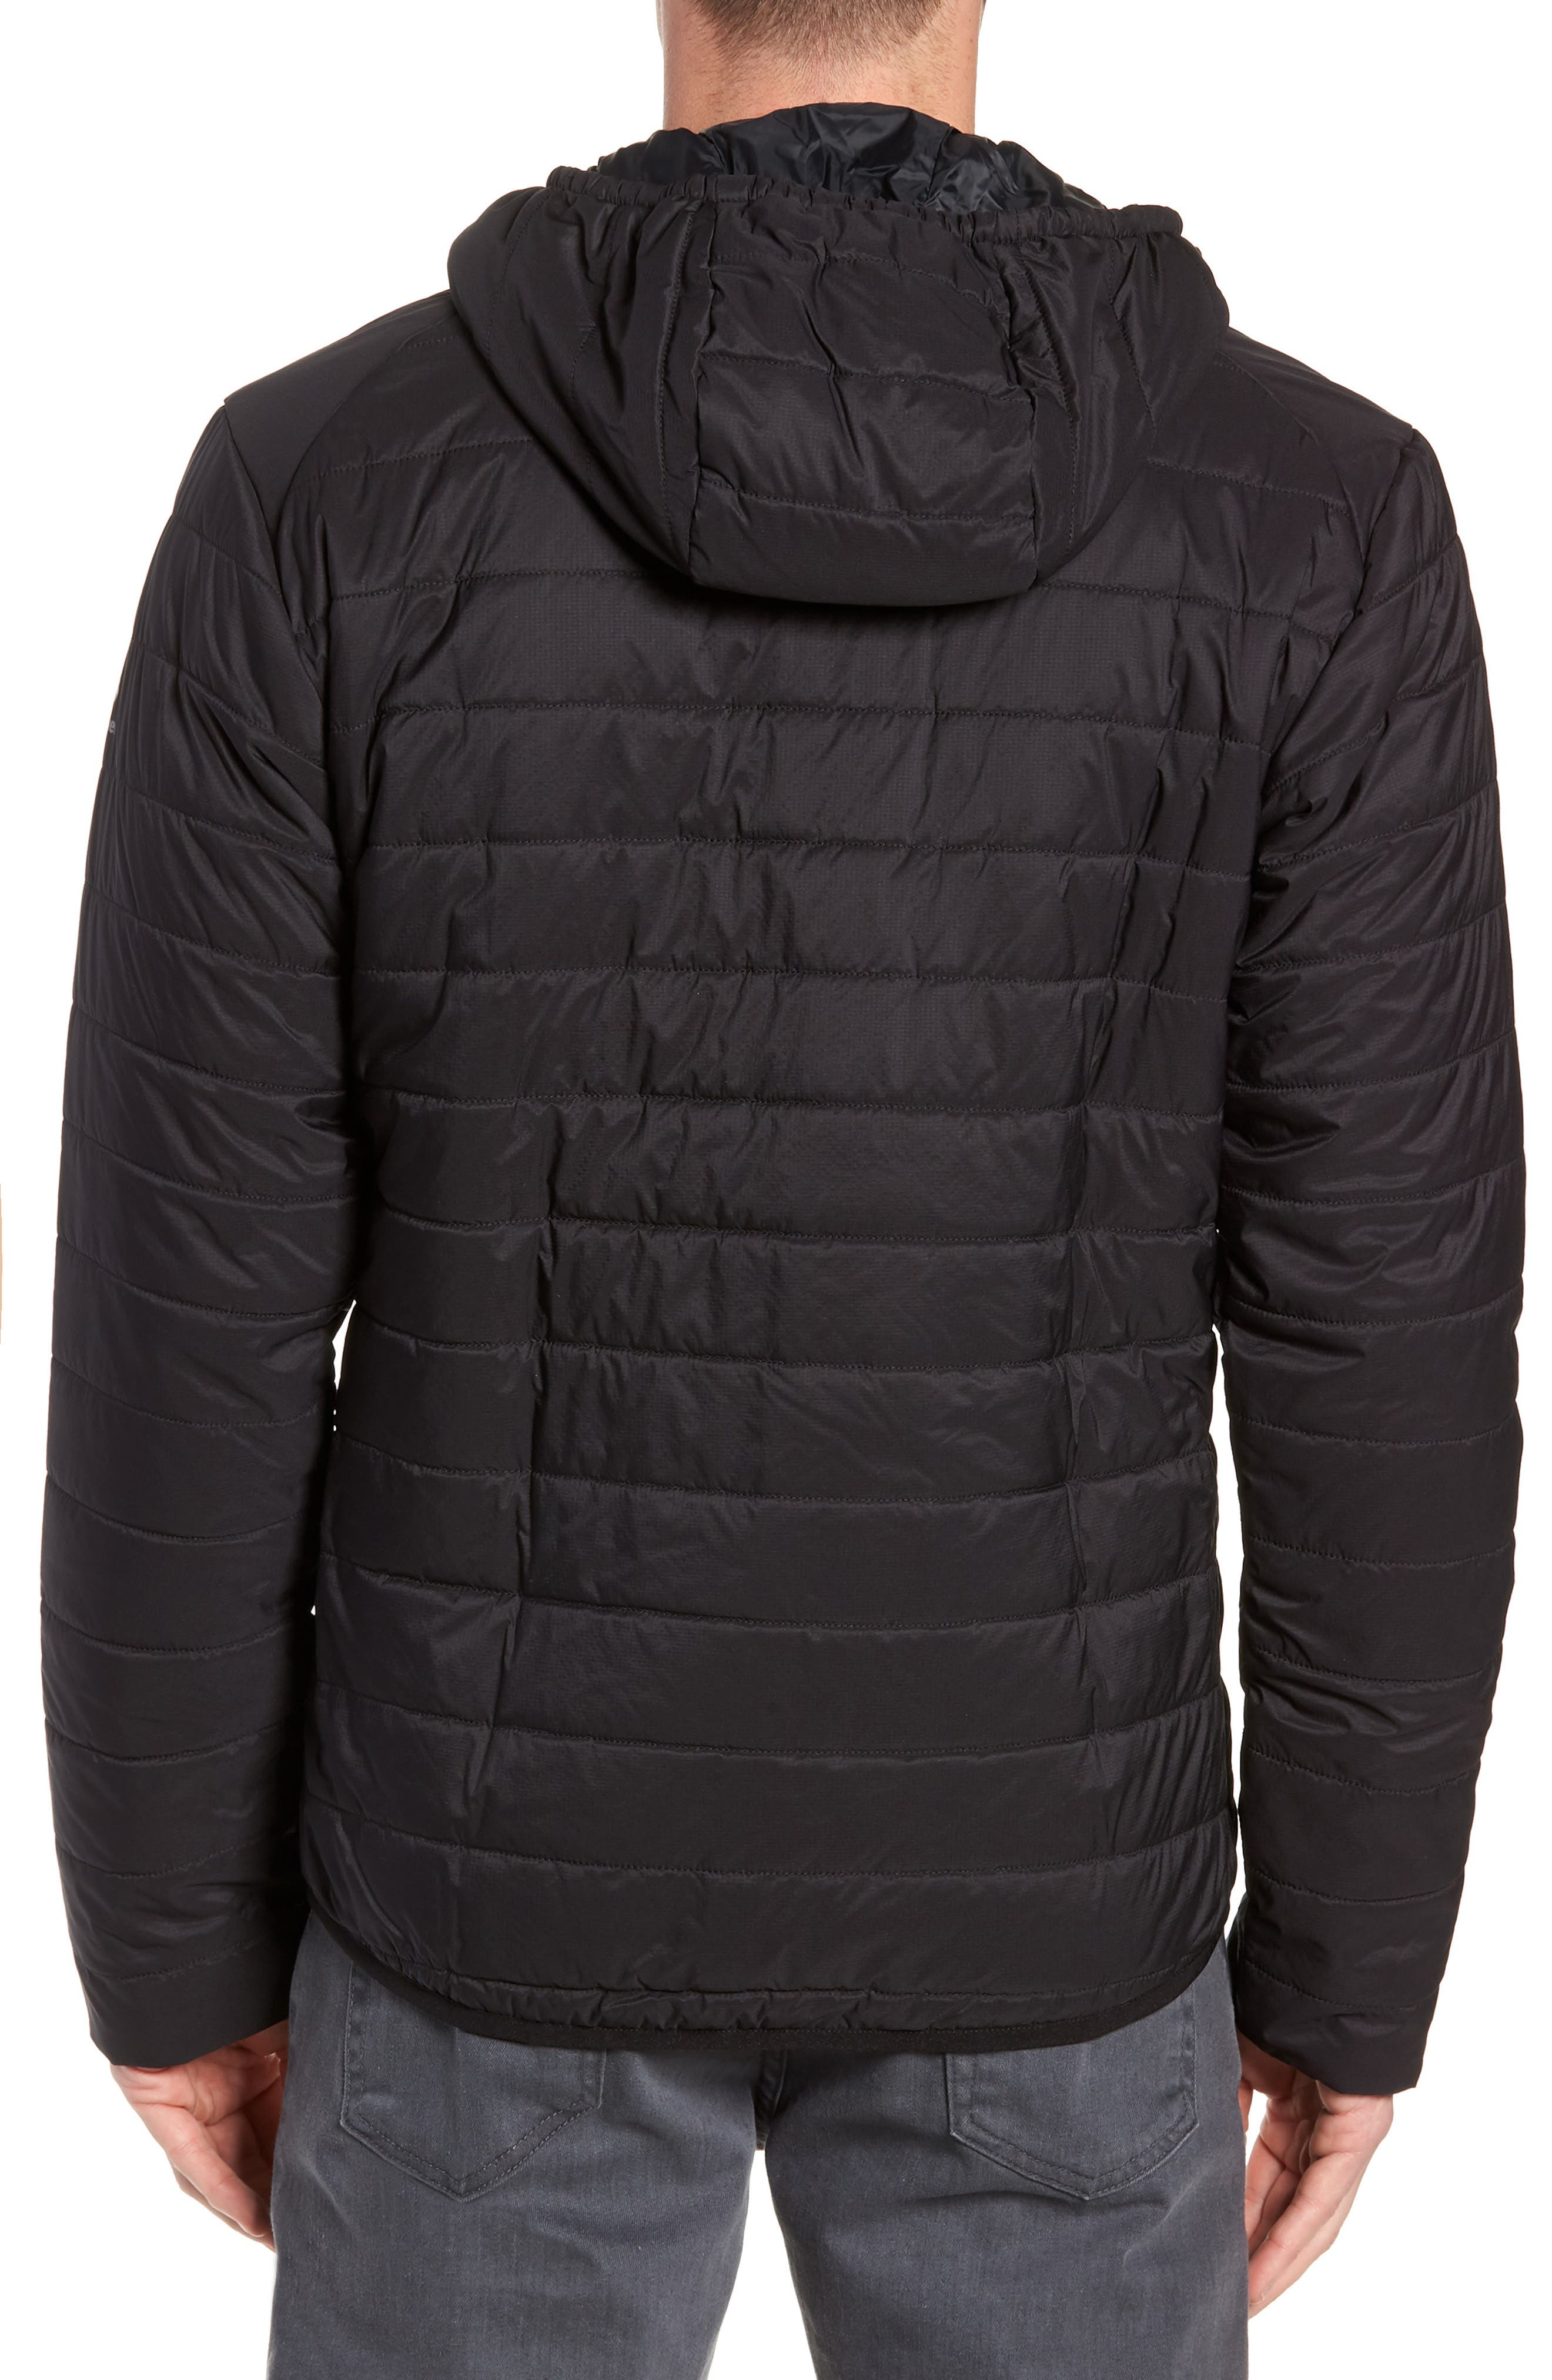 Hyperia MerinoLOFT<sup>™</sup> Hooded Jacket,                             Alternate thumbnail 2, color,                             BLACK